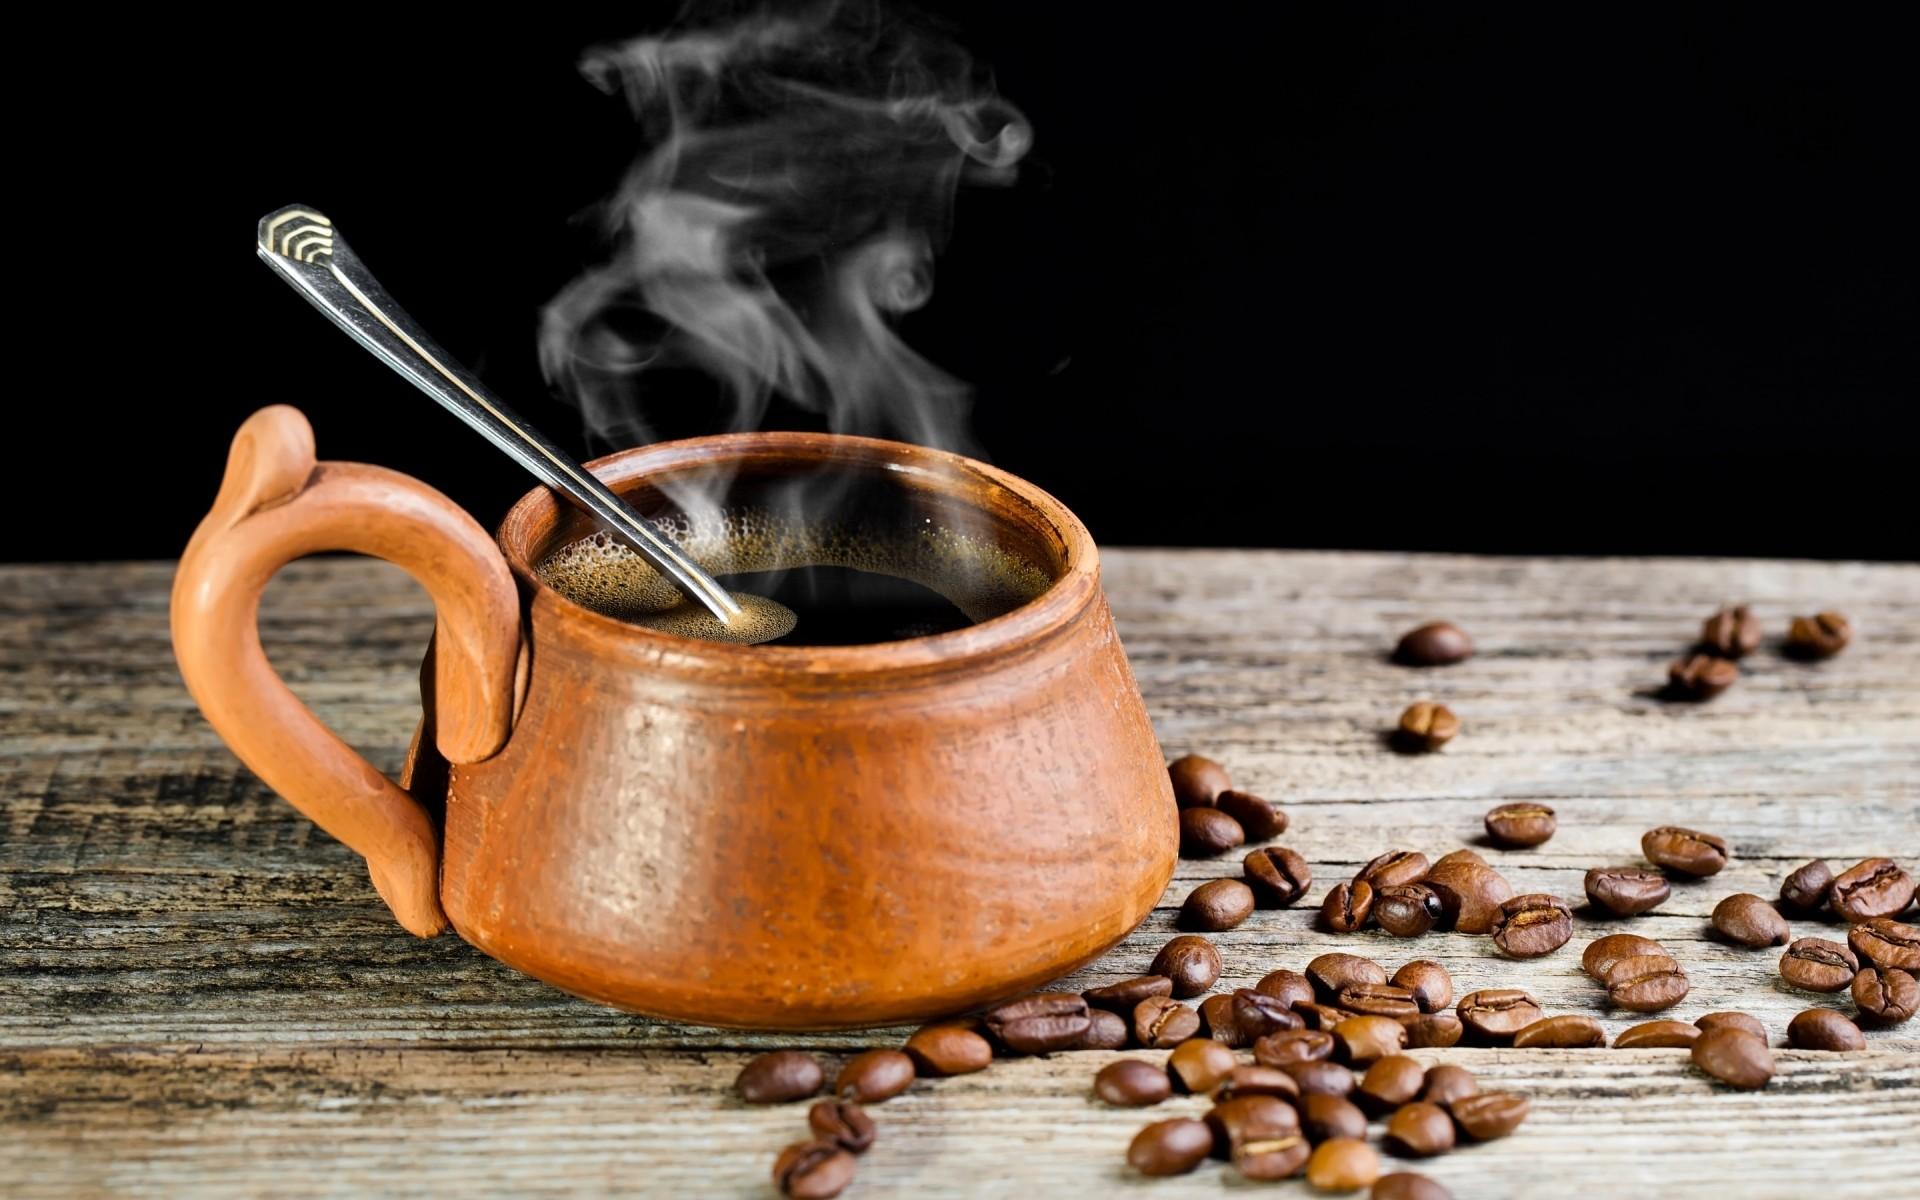 Картинки на рабочий чашка кофе